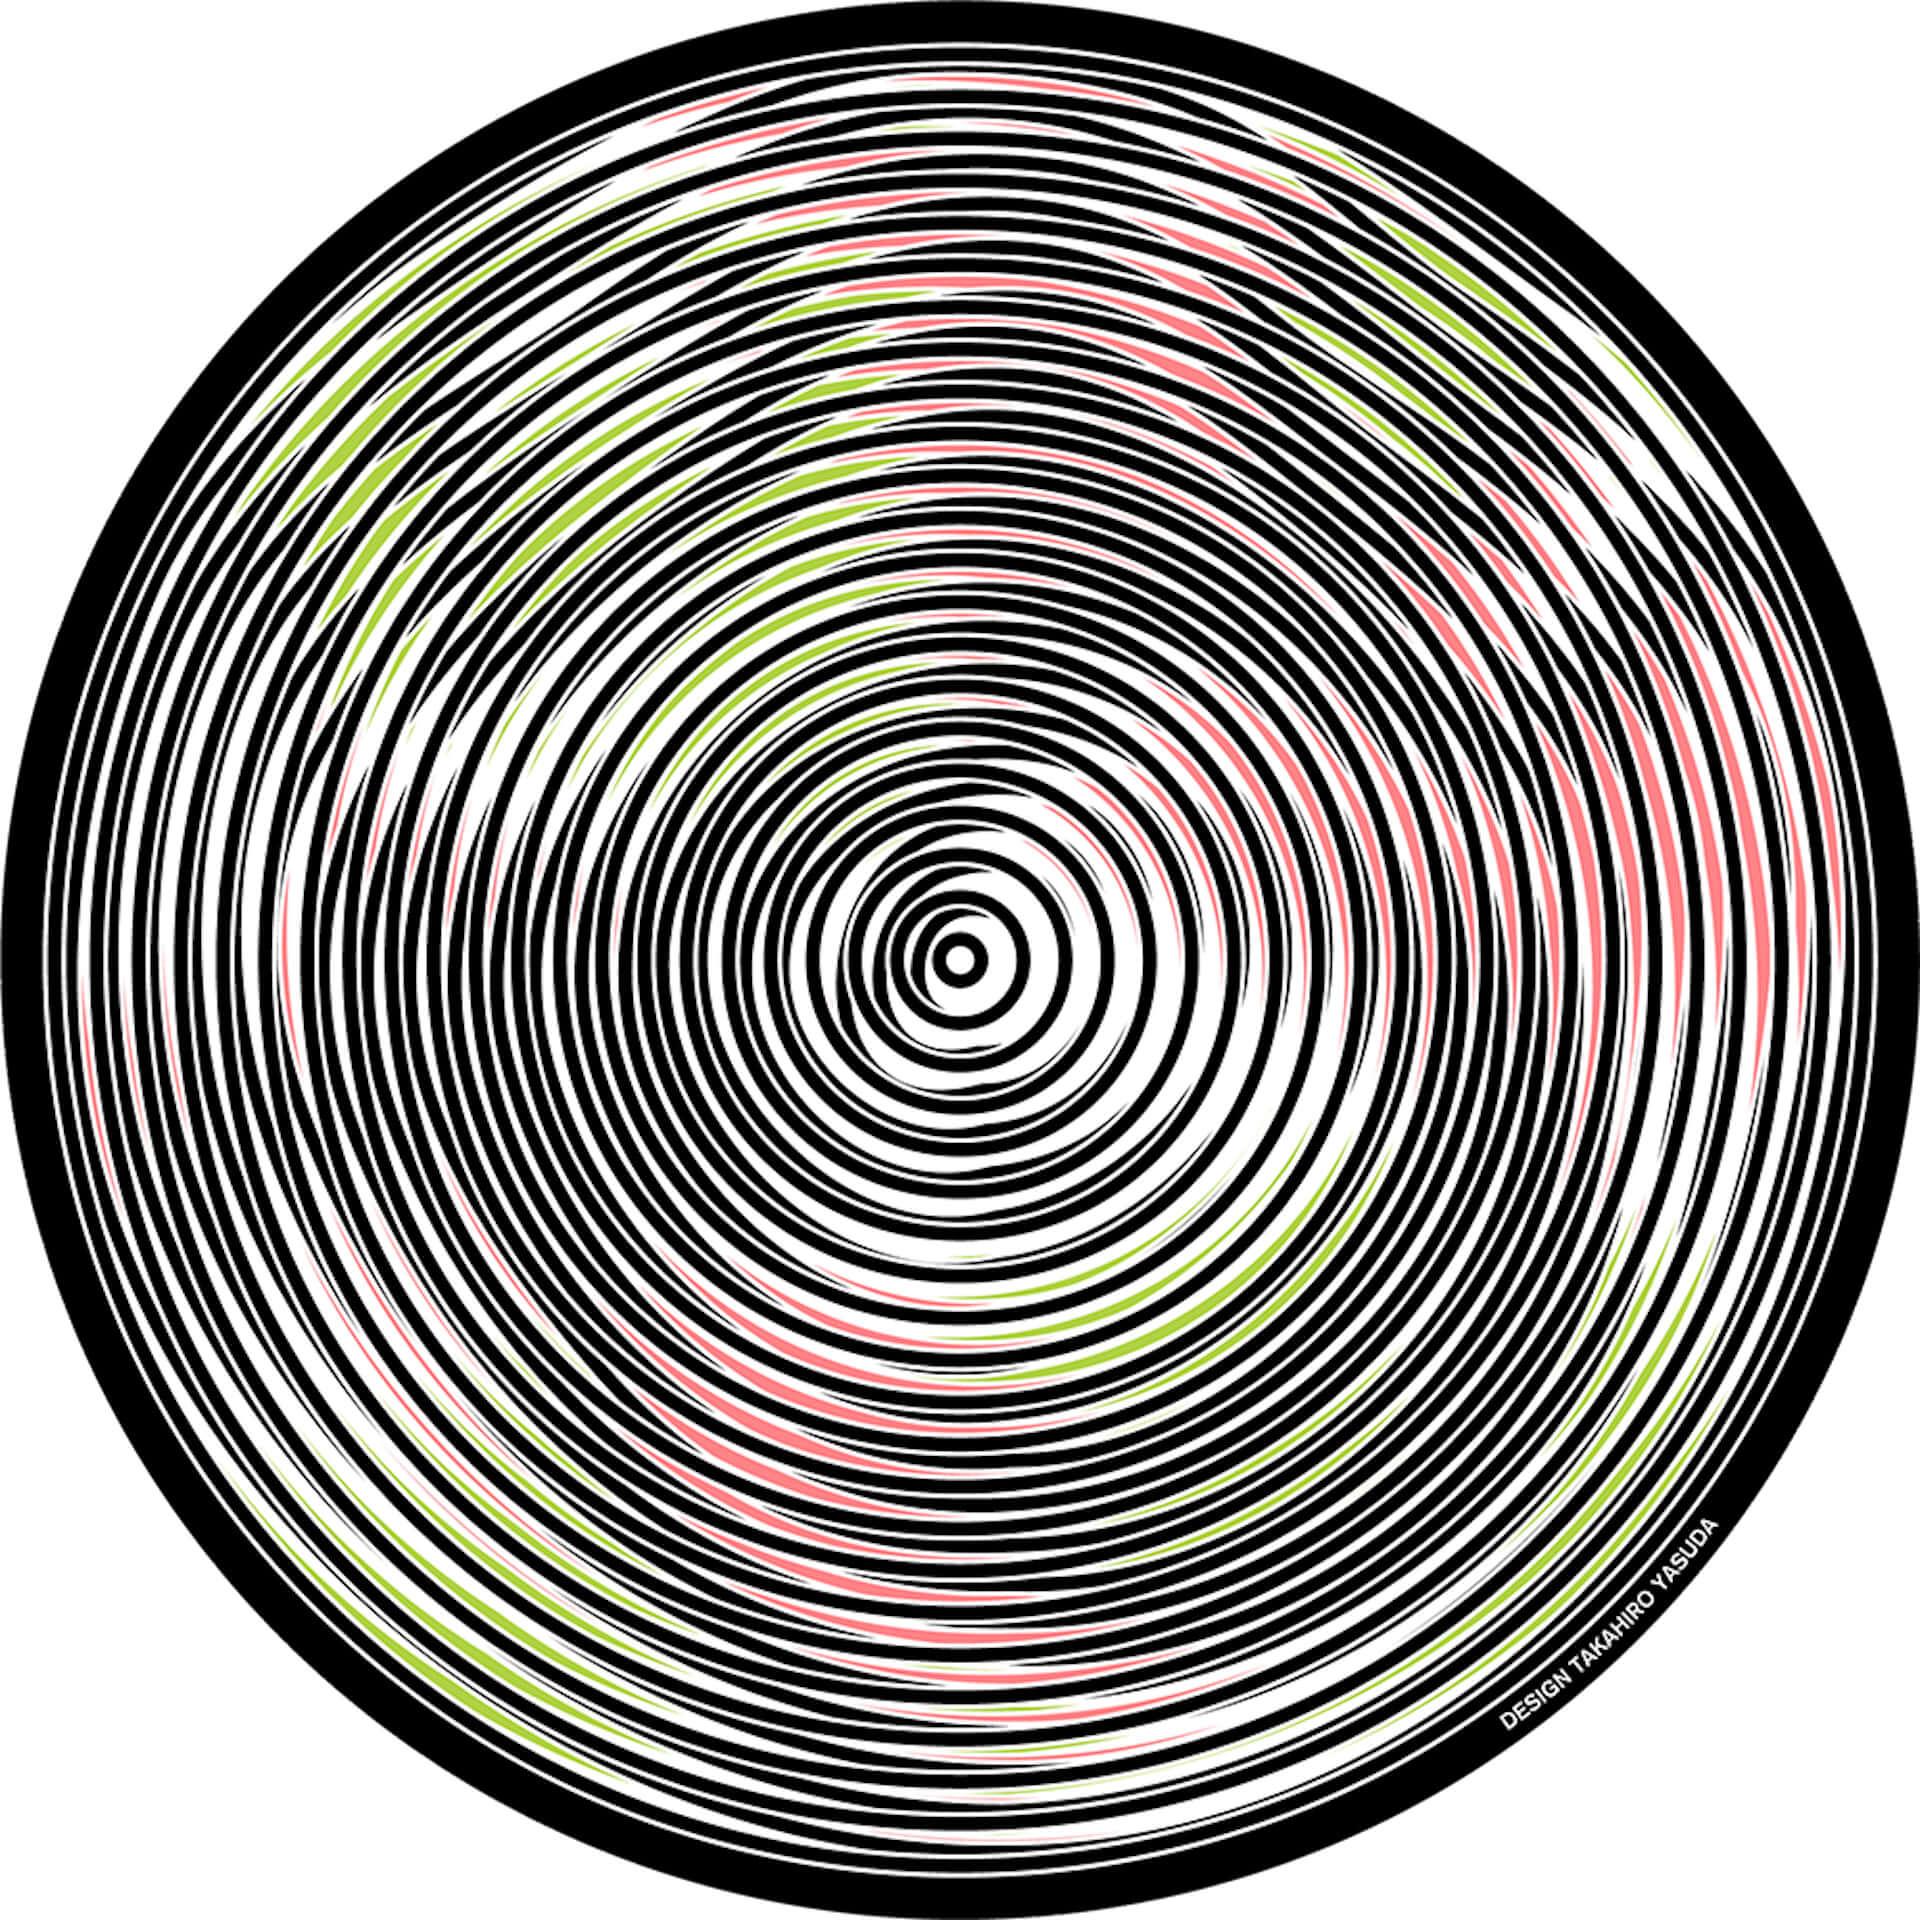 CEKAIの24時間DJ配信局『FM SON』に長場雄、安田昂弘、Masayoshi Iimori、OWNCEANらが新たに参加! musci200522_cekai_fmson_5-1-1920x1920